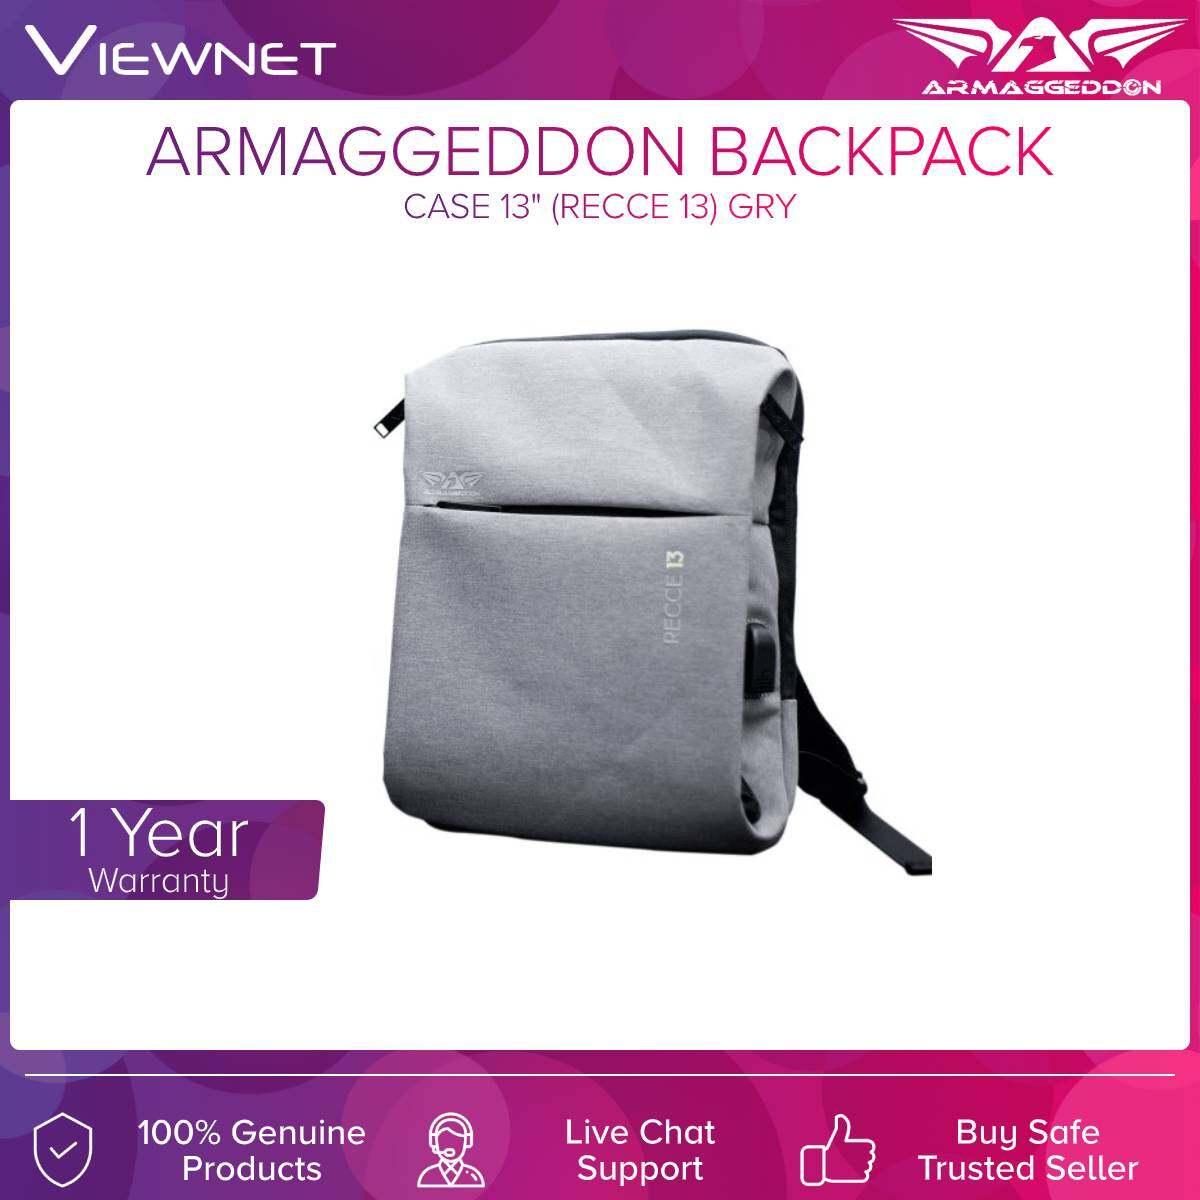 Armaggeddon Backpack 13'' (RECCE 13)